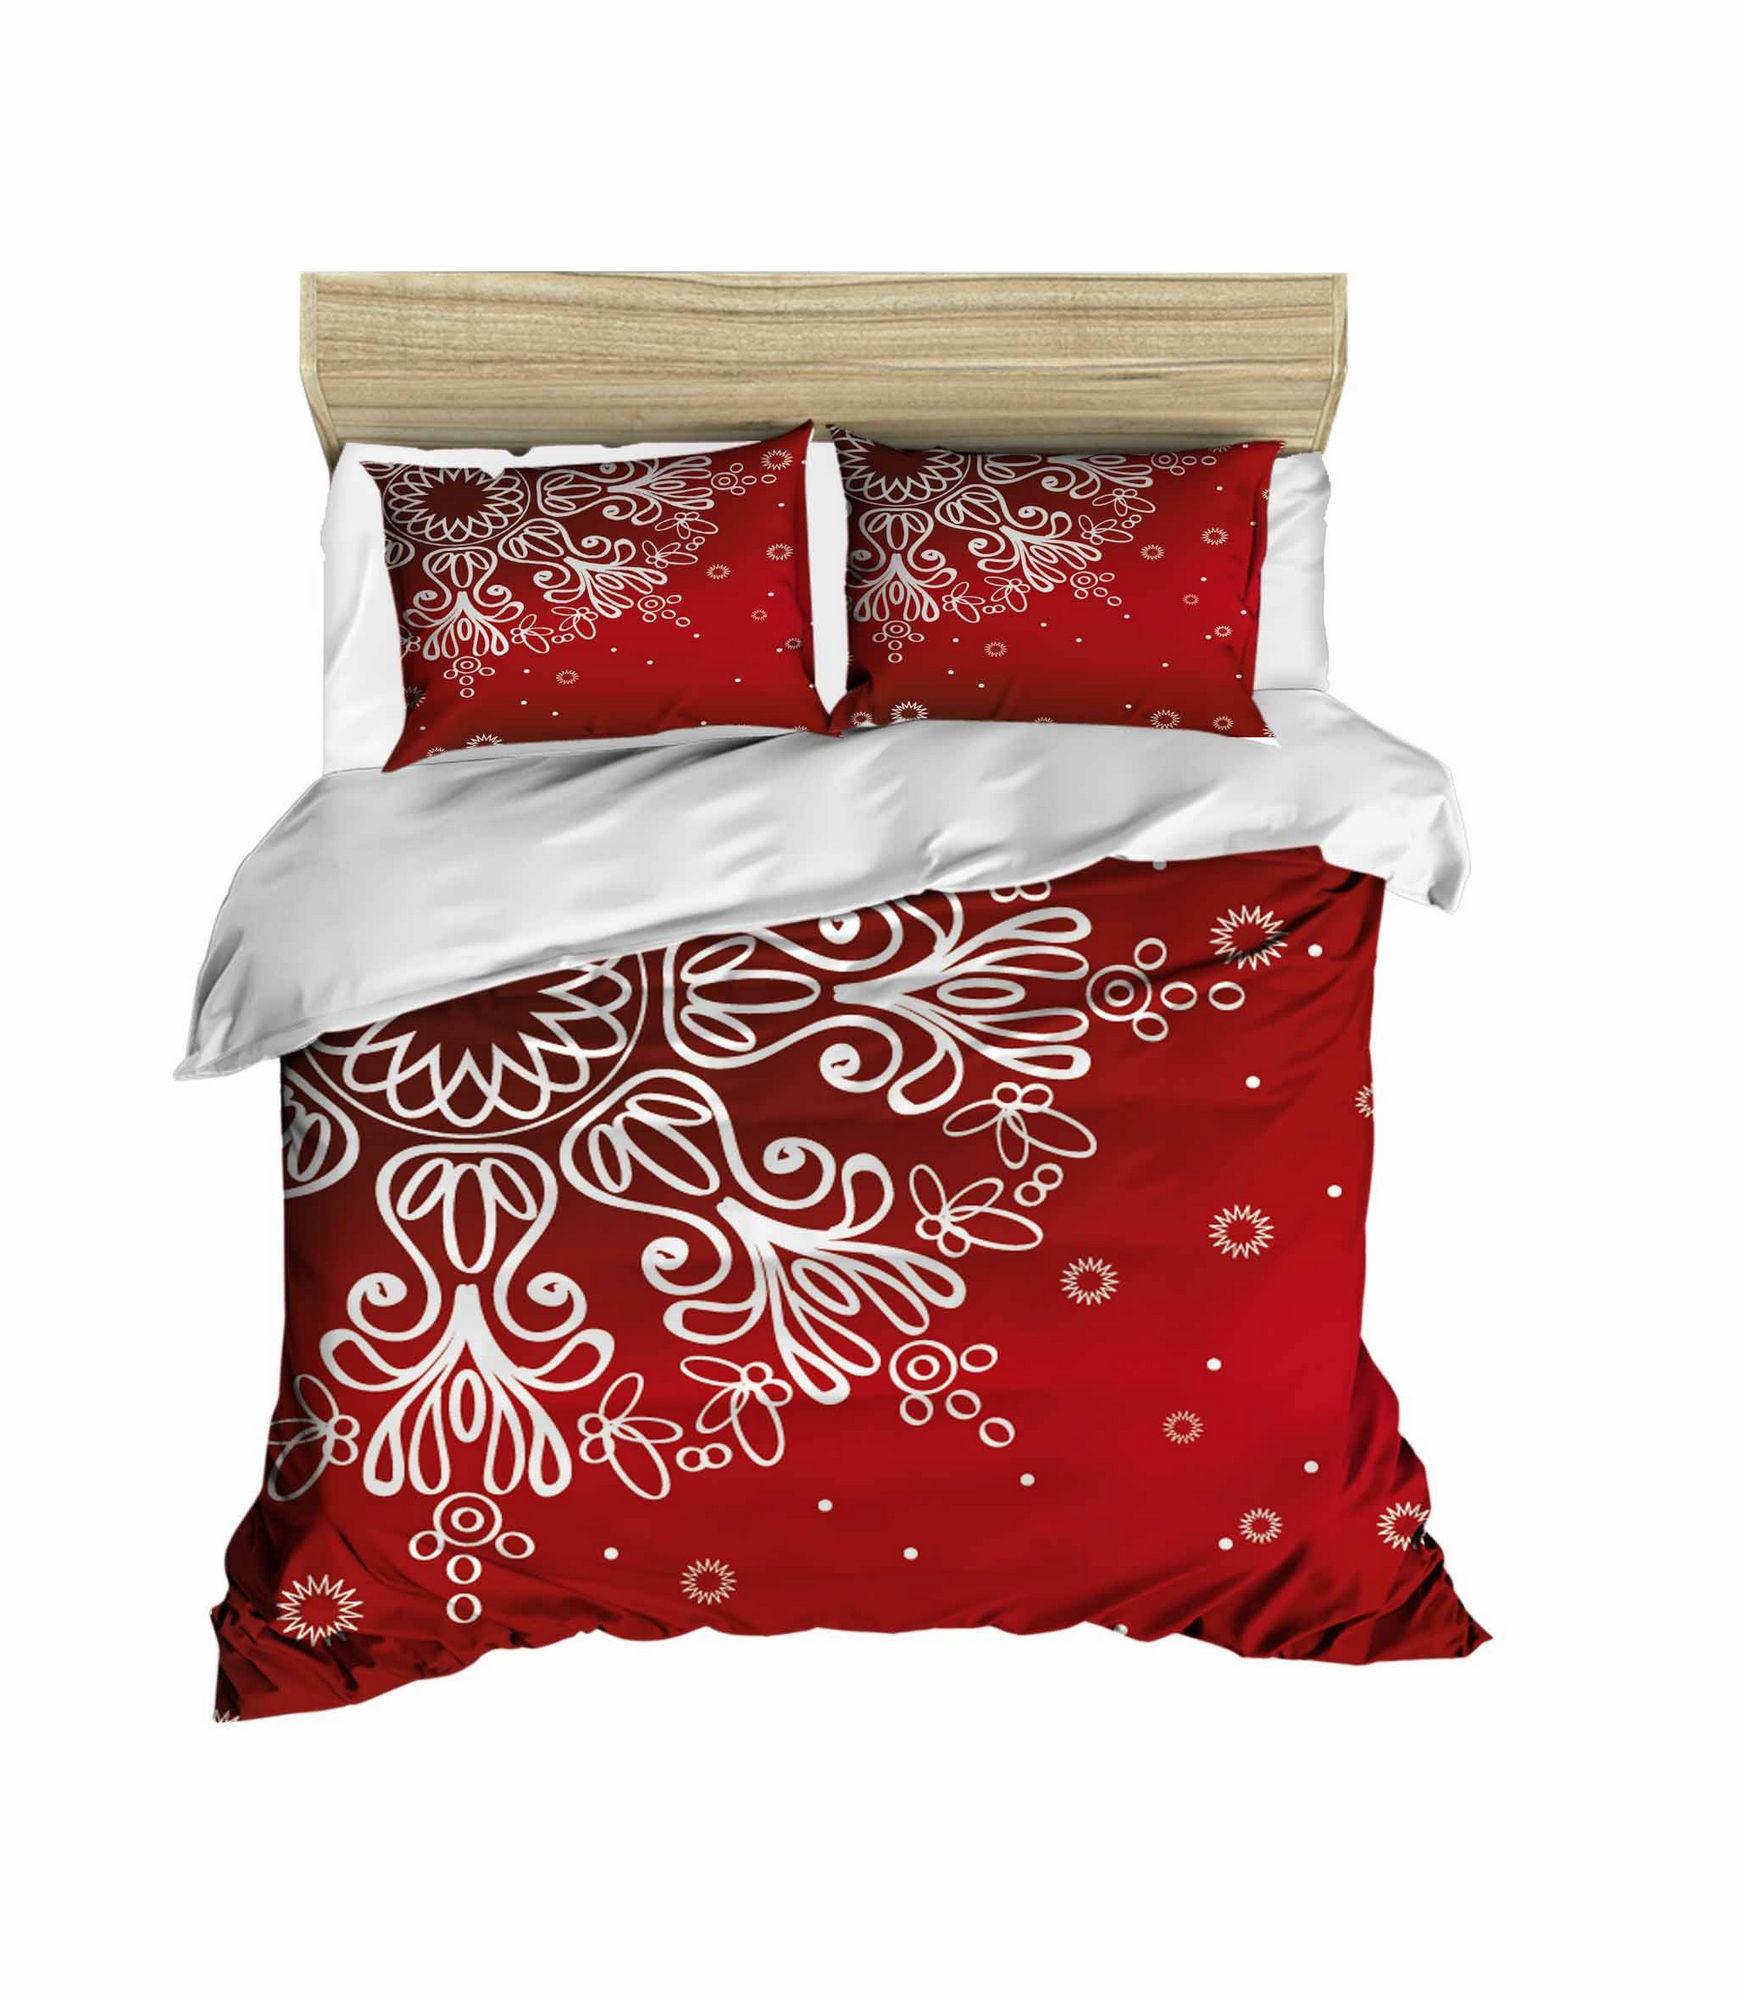 Lenjerie de pat din bumbac si microfibra Christmas 427 Rosu / Alb, 200 x 220 cm imagine